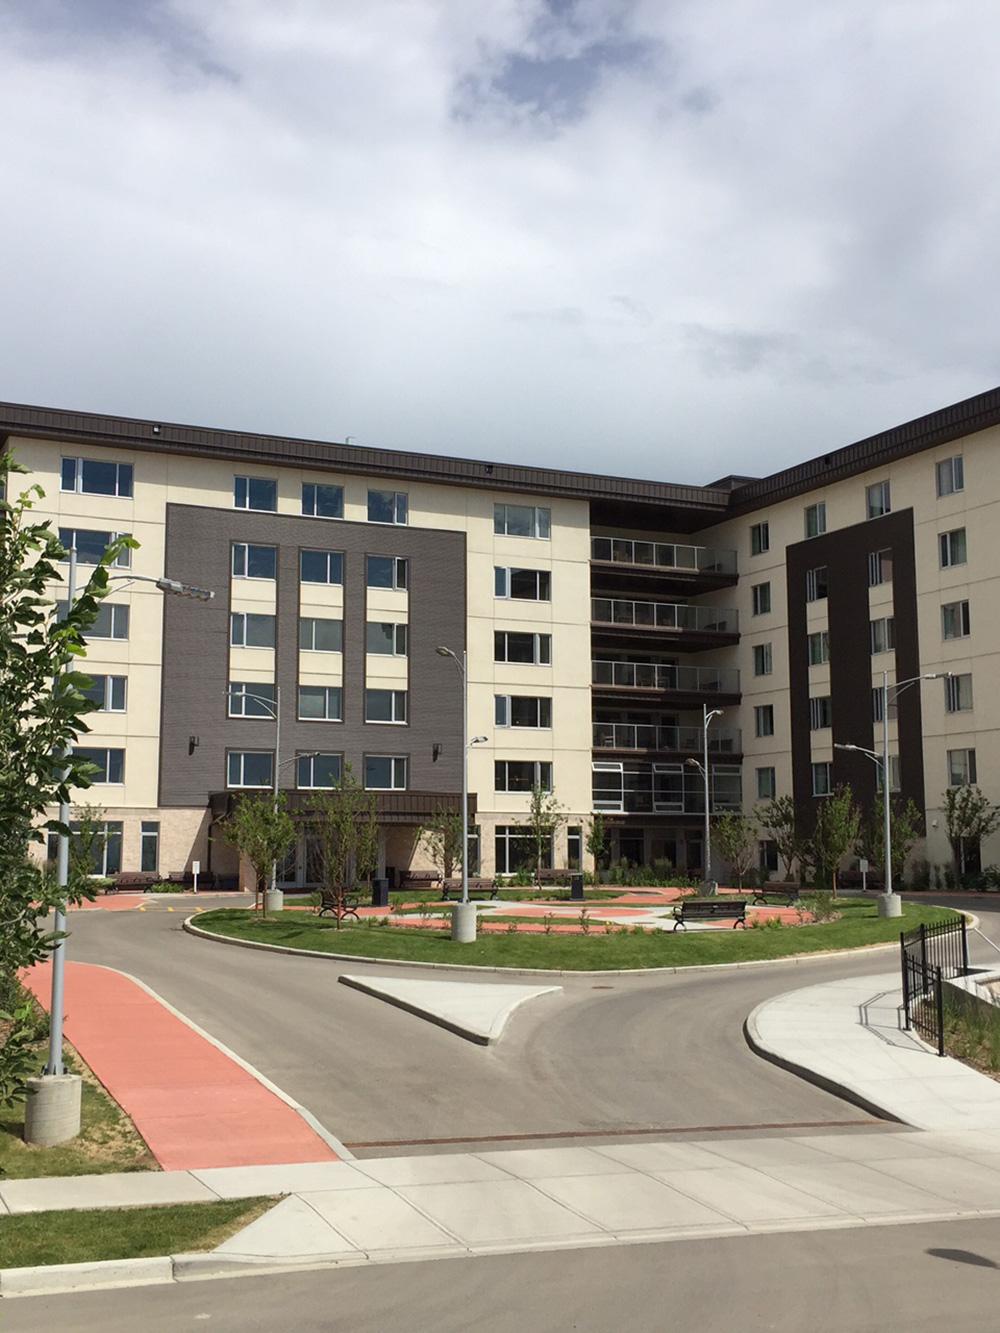 Seton Seniors Facility - Calgary Mechanical Contracting